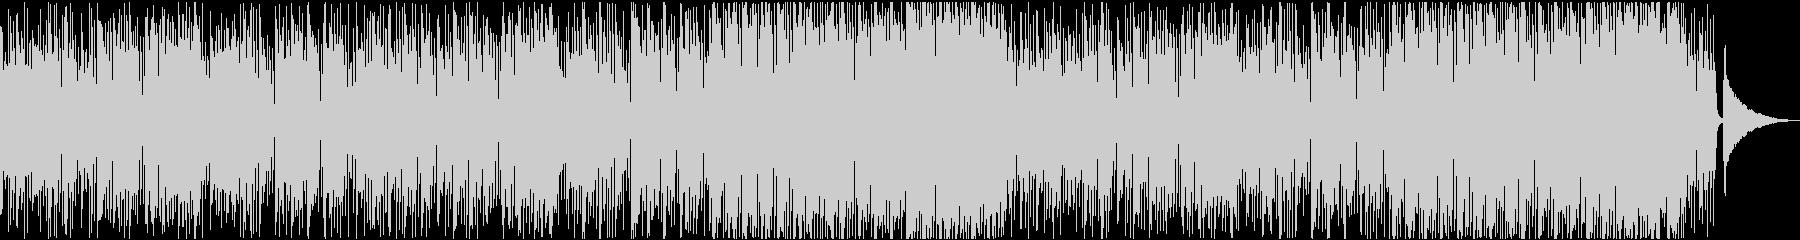 BGM for light acoustic guitar images's unreproduced waveform